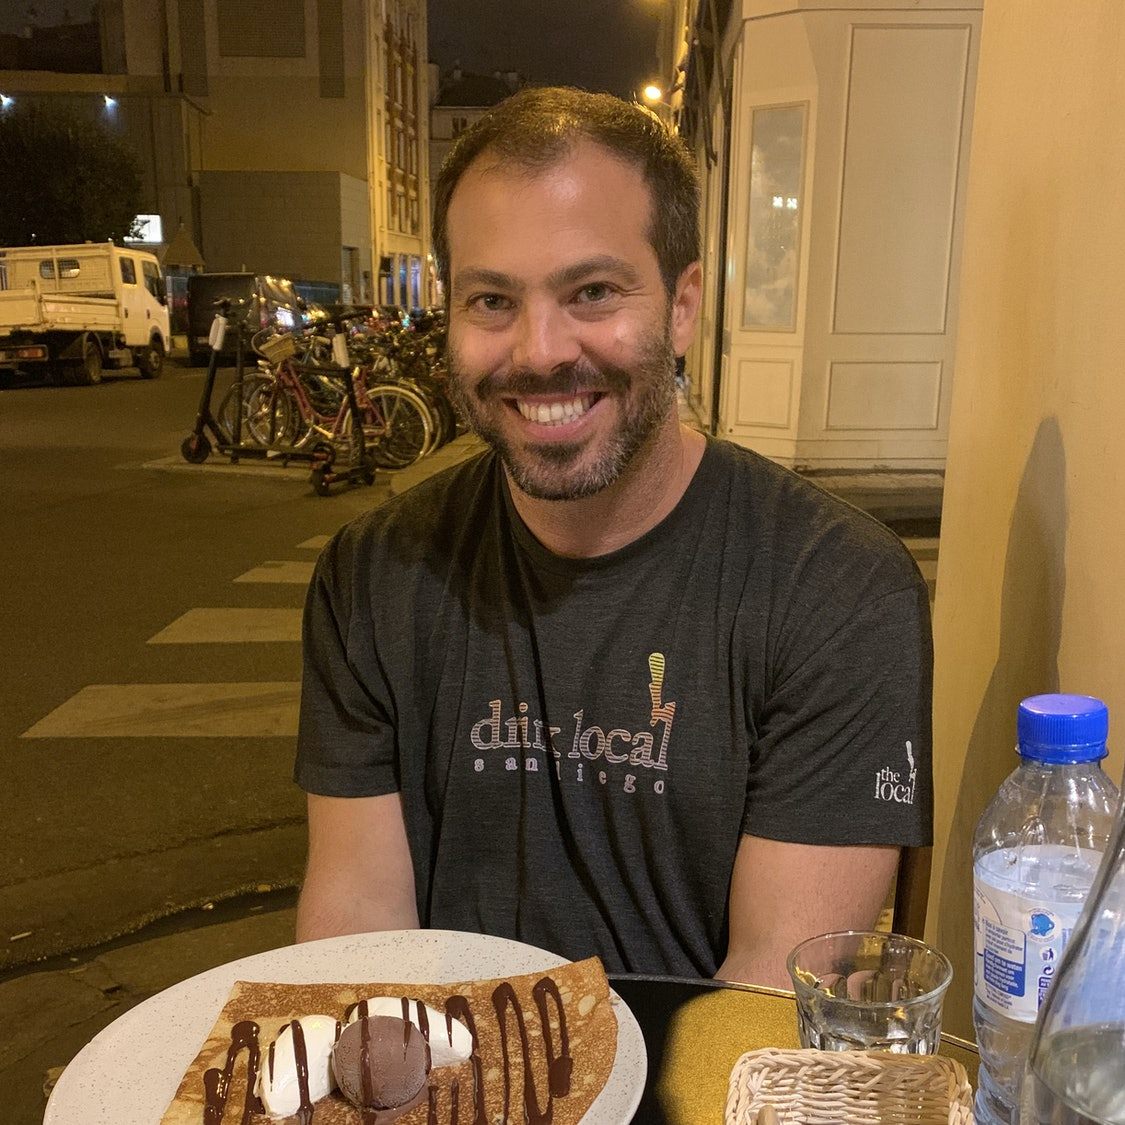 Aaron Hall at a restaurant